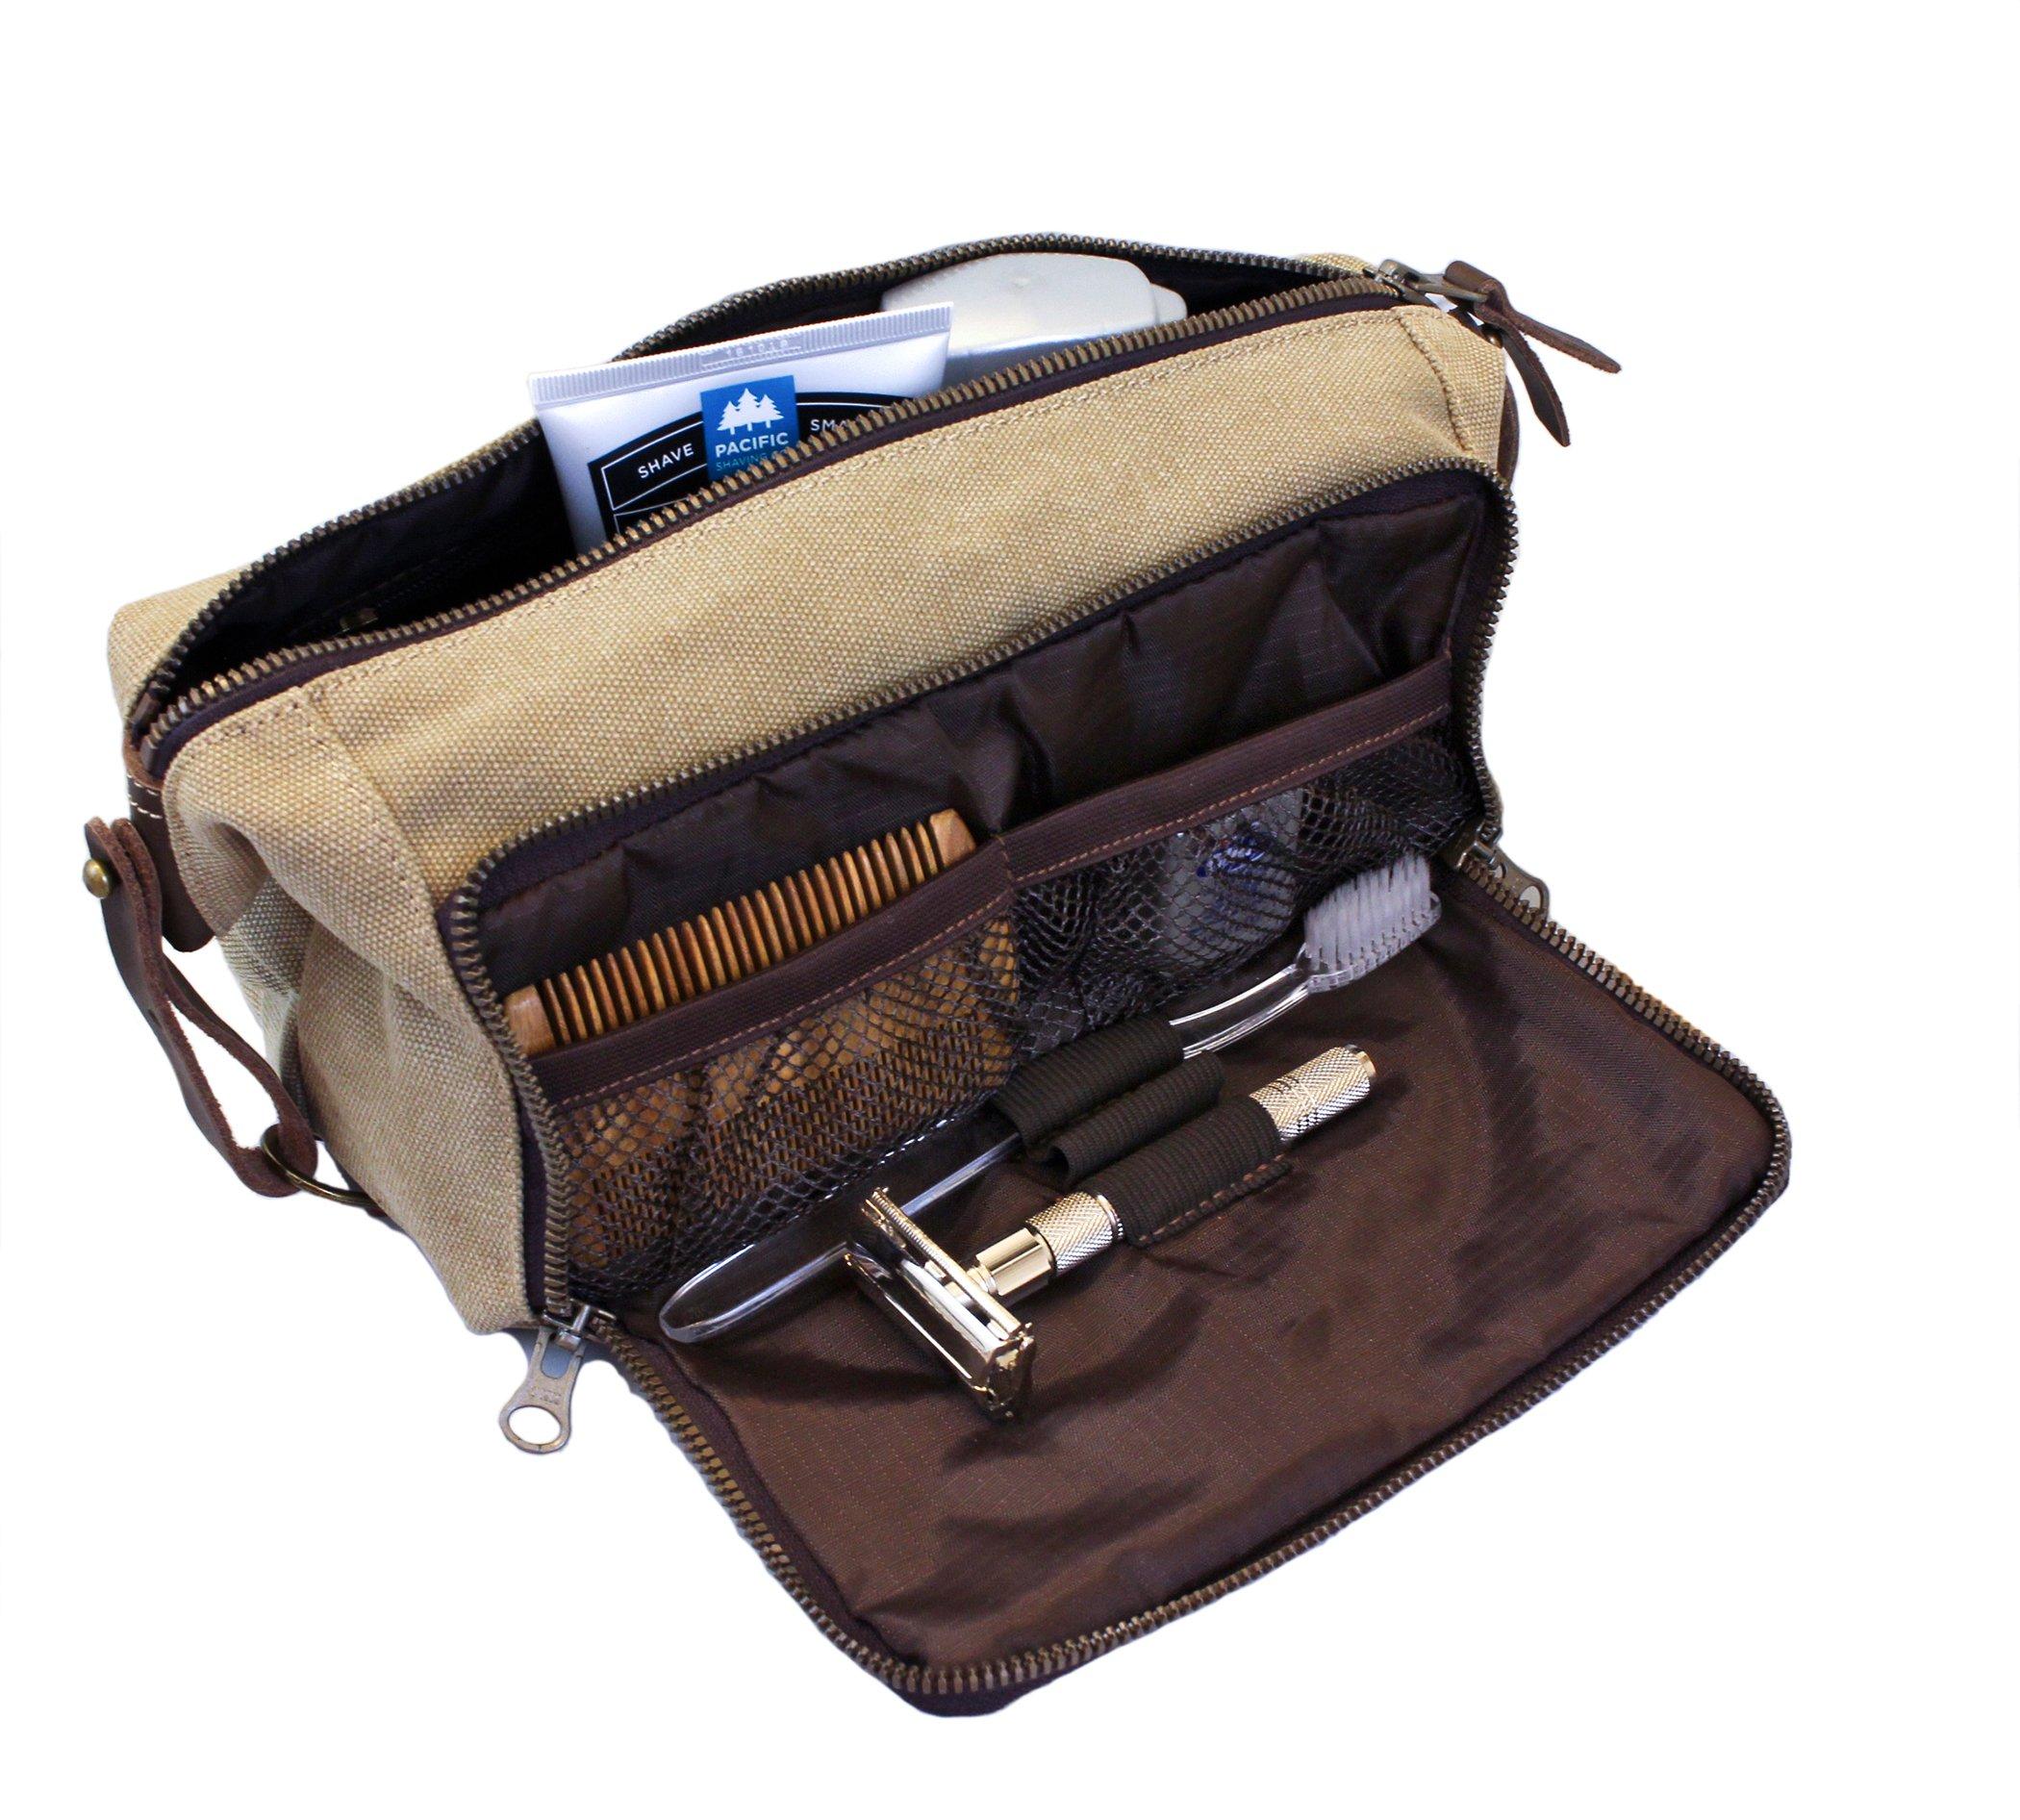 Amazon.com   DOPP Kit Mens Toiletry Travel Bag YKK Zipper Canvas ... 37dae2e5e790e